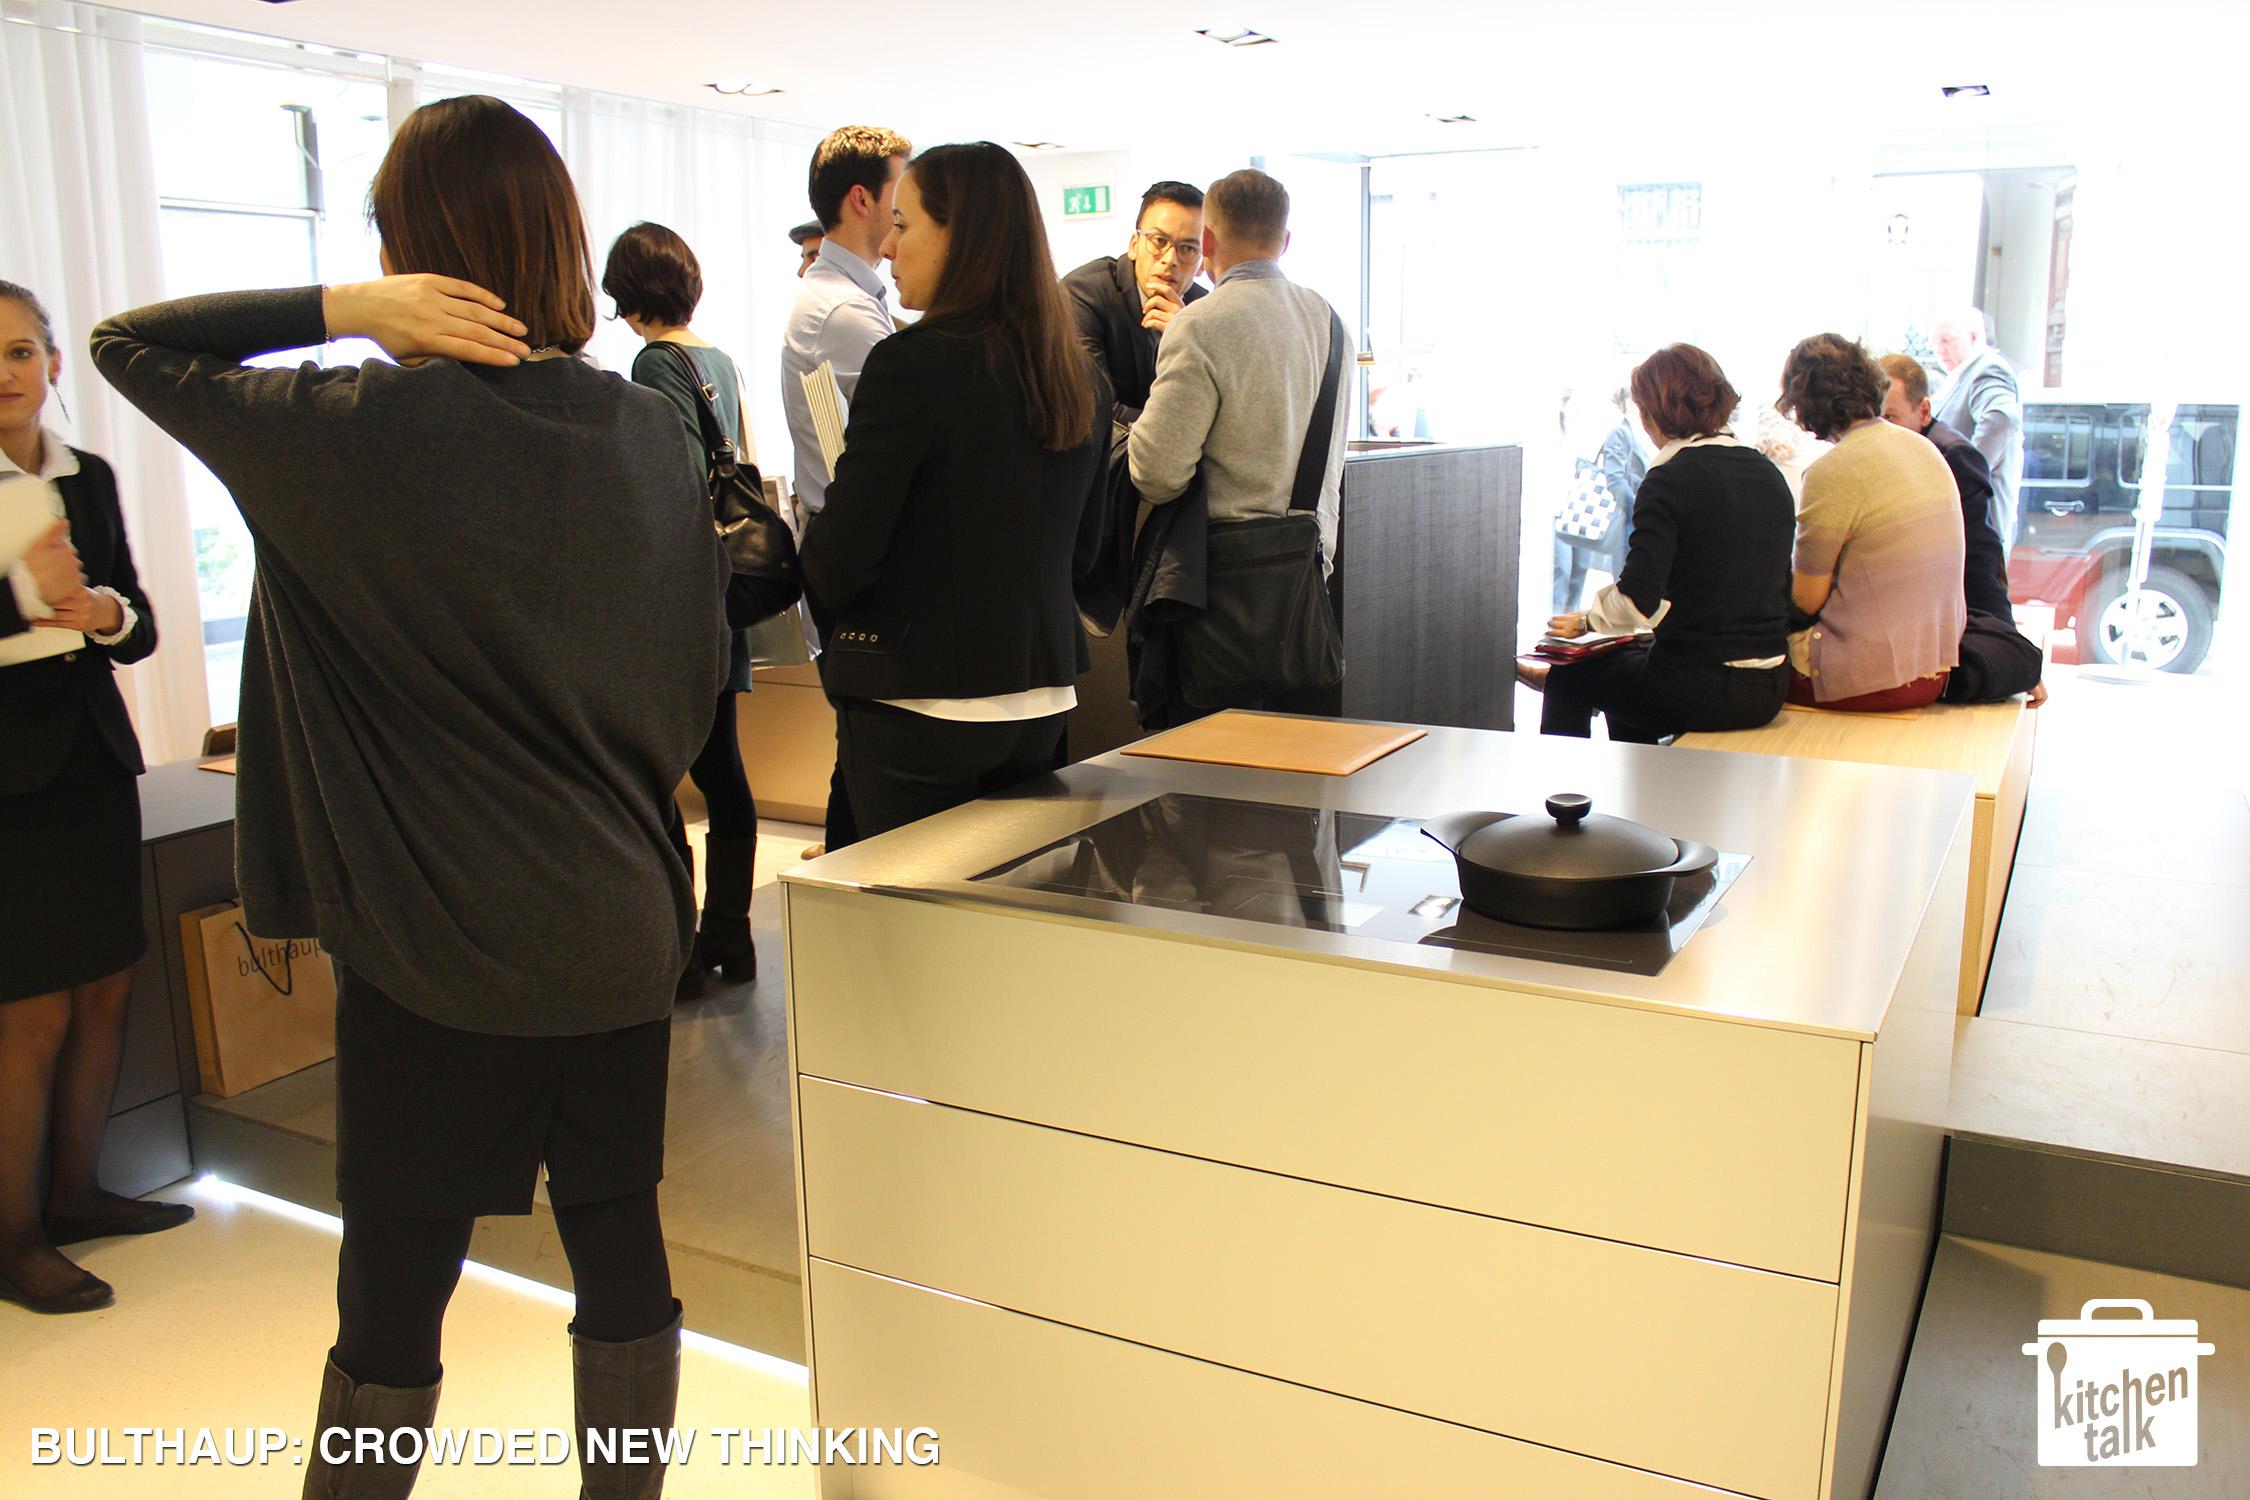 bulthaup kitchens @ milano 2013 ? back to the future | kitchen ... - Otl Aicher Die Küche Zum Kochen